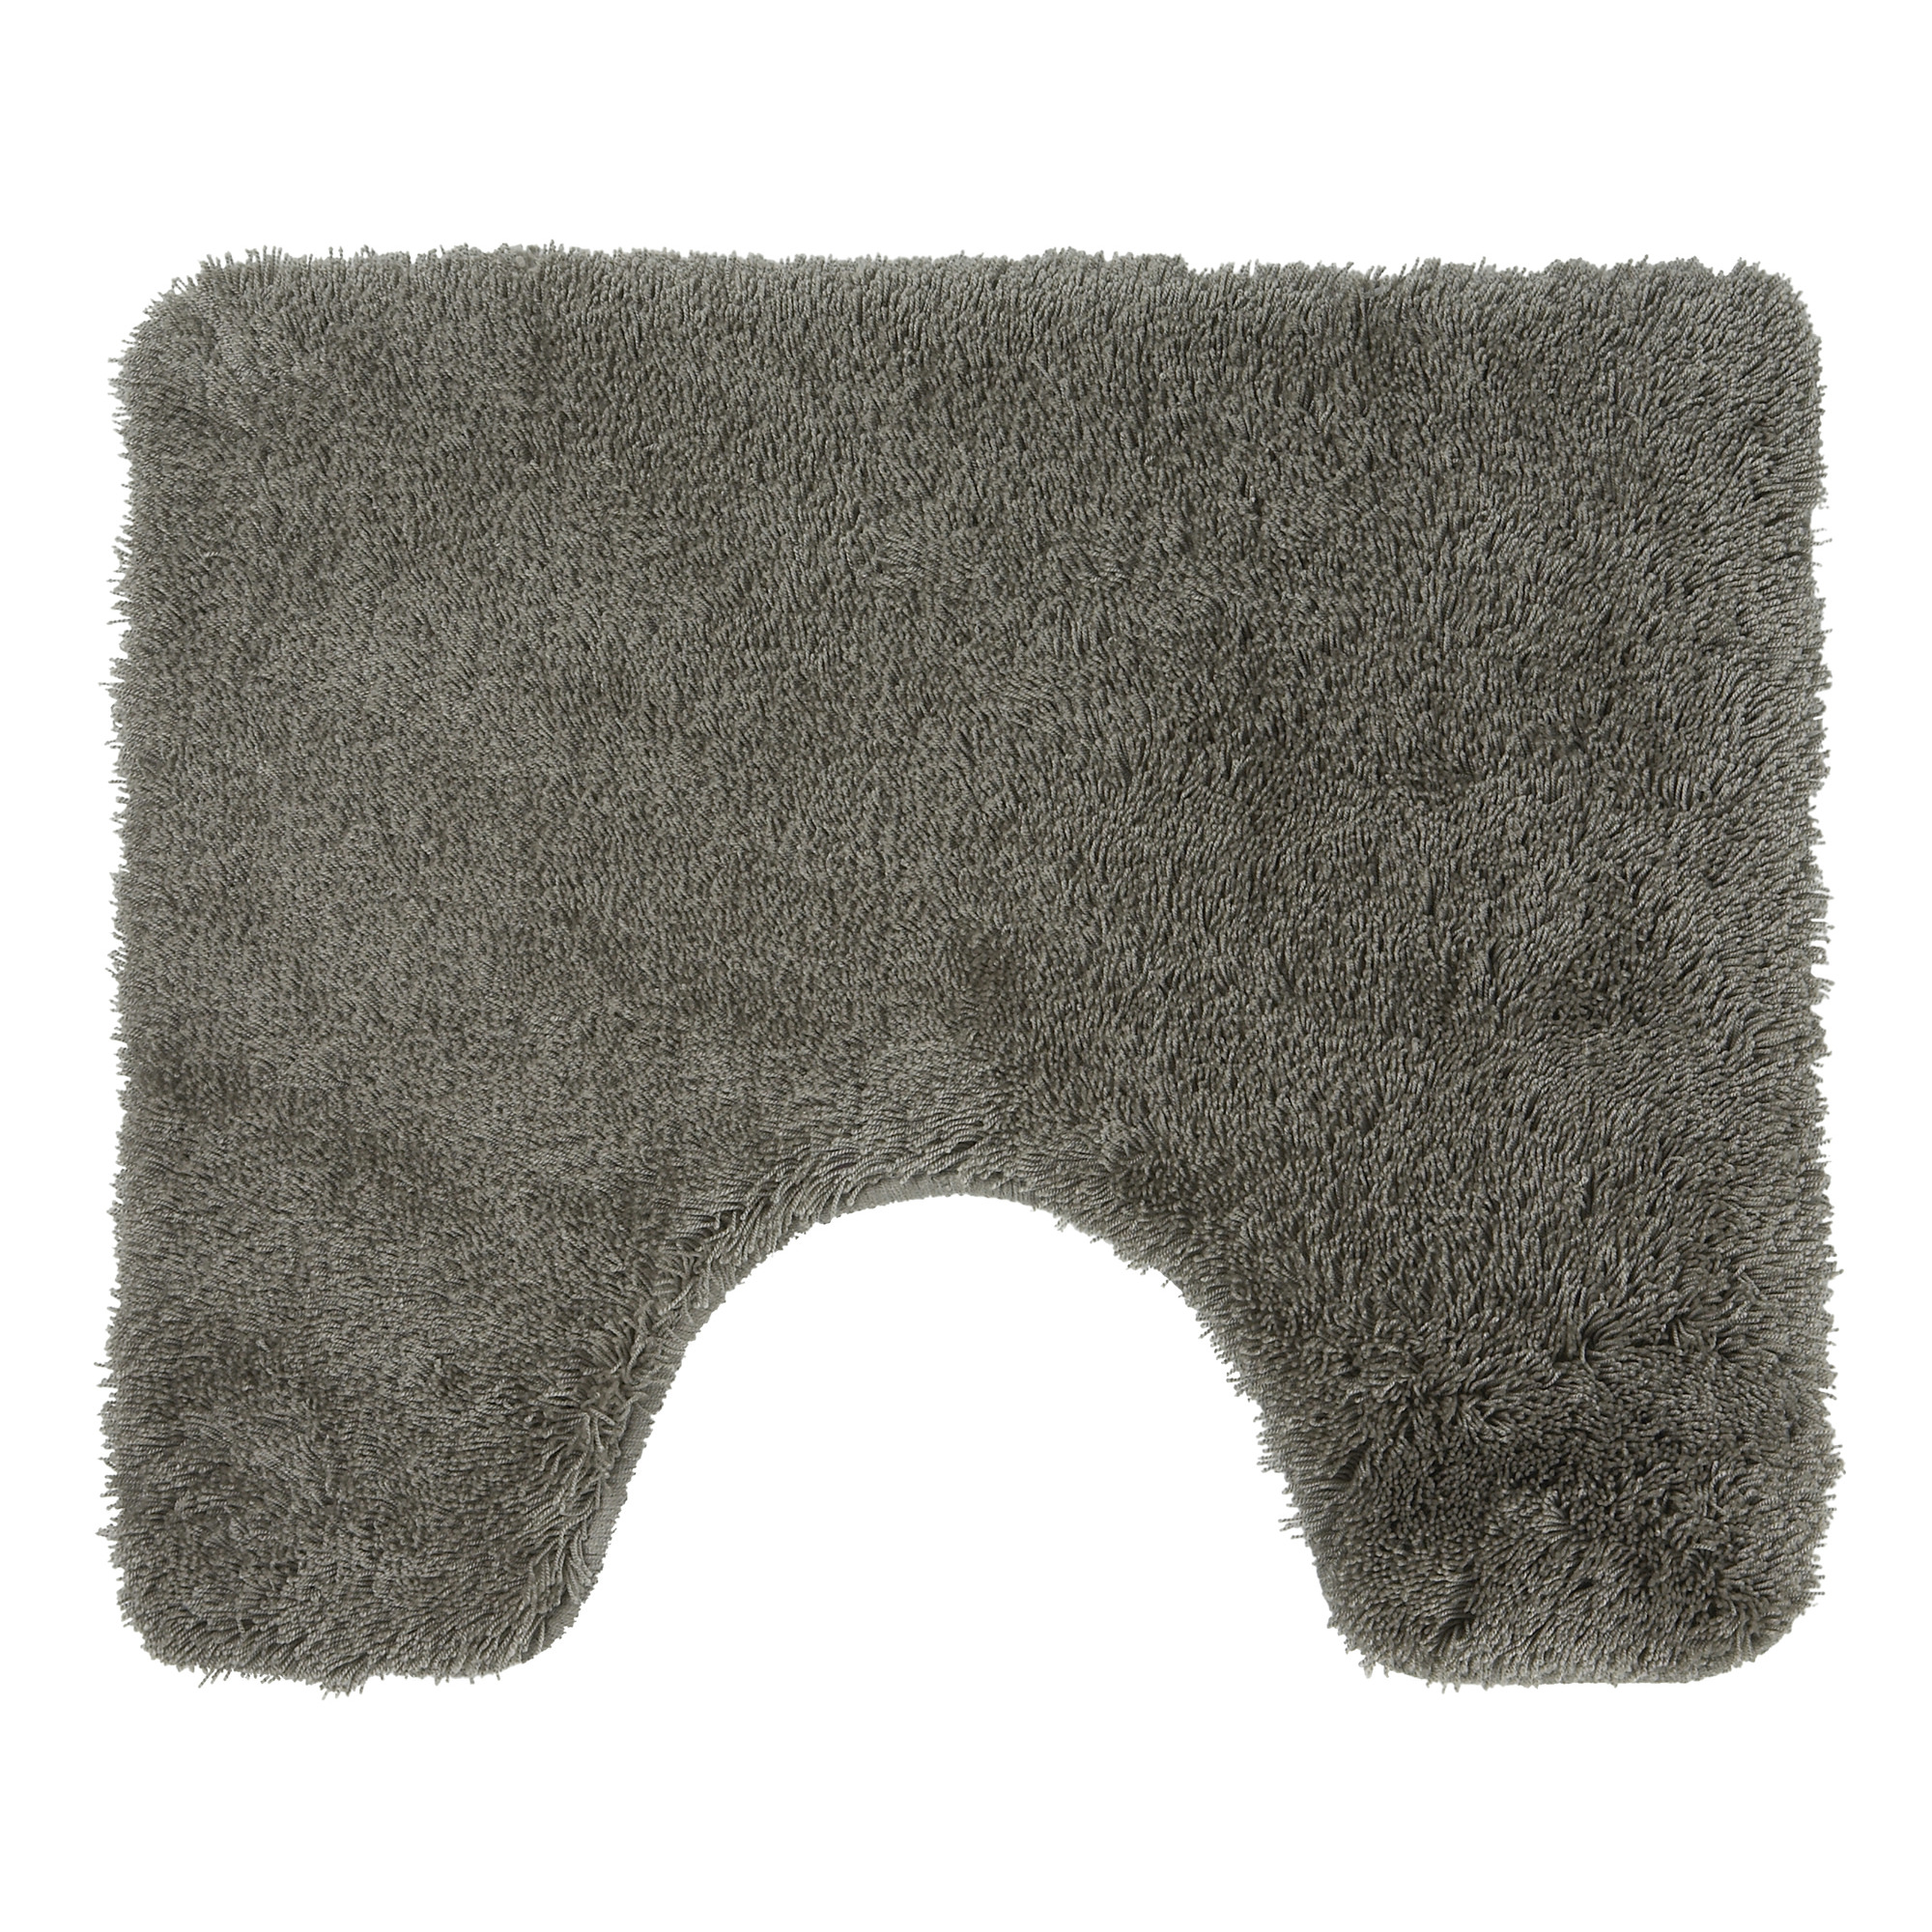 tapis de toilette lusanne gamma 50x60 cm anthracite. Black Bedroom Furniture Sets. Home Design Ideas